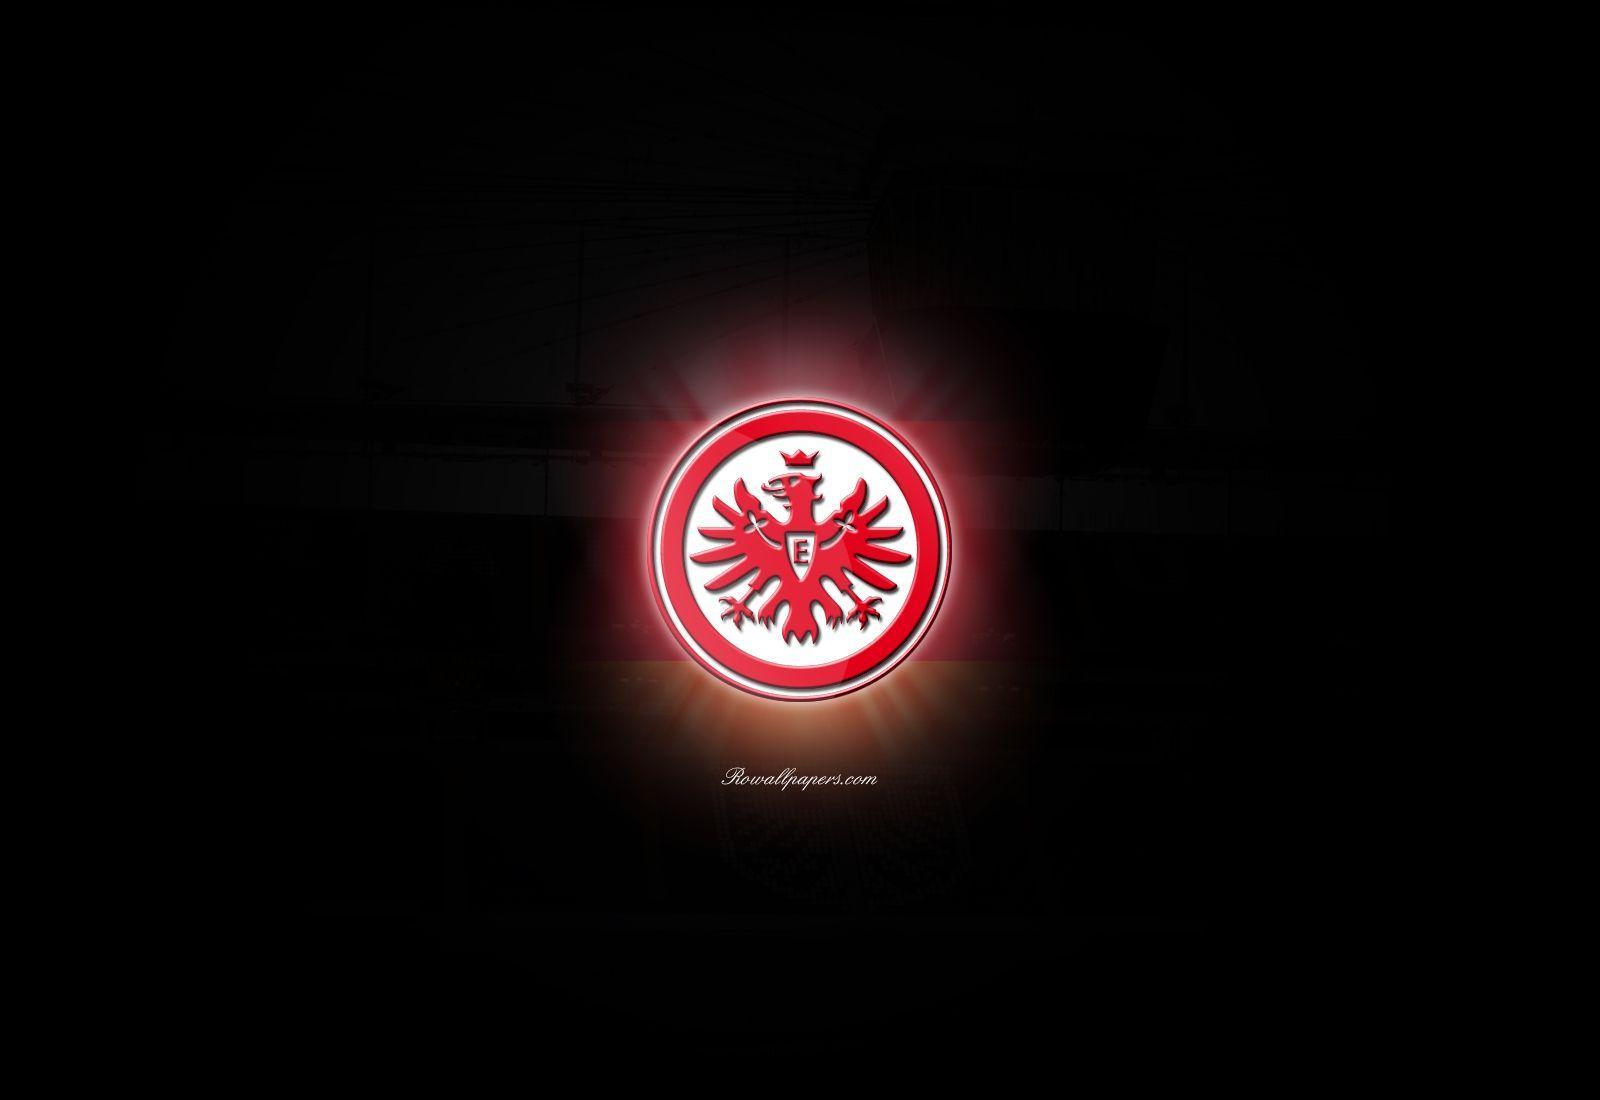 Eintracht Frankfurt Wallpapers Wallpaper Cave